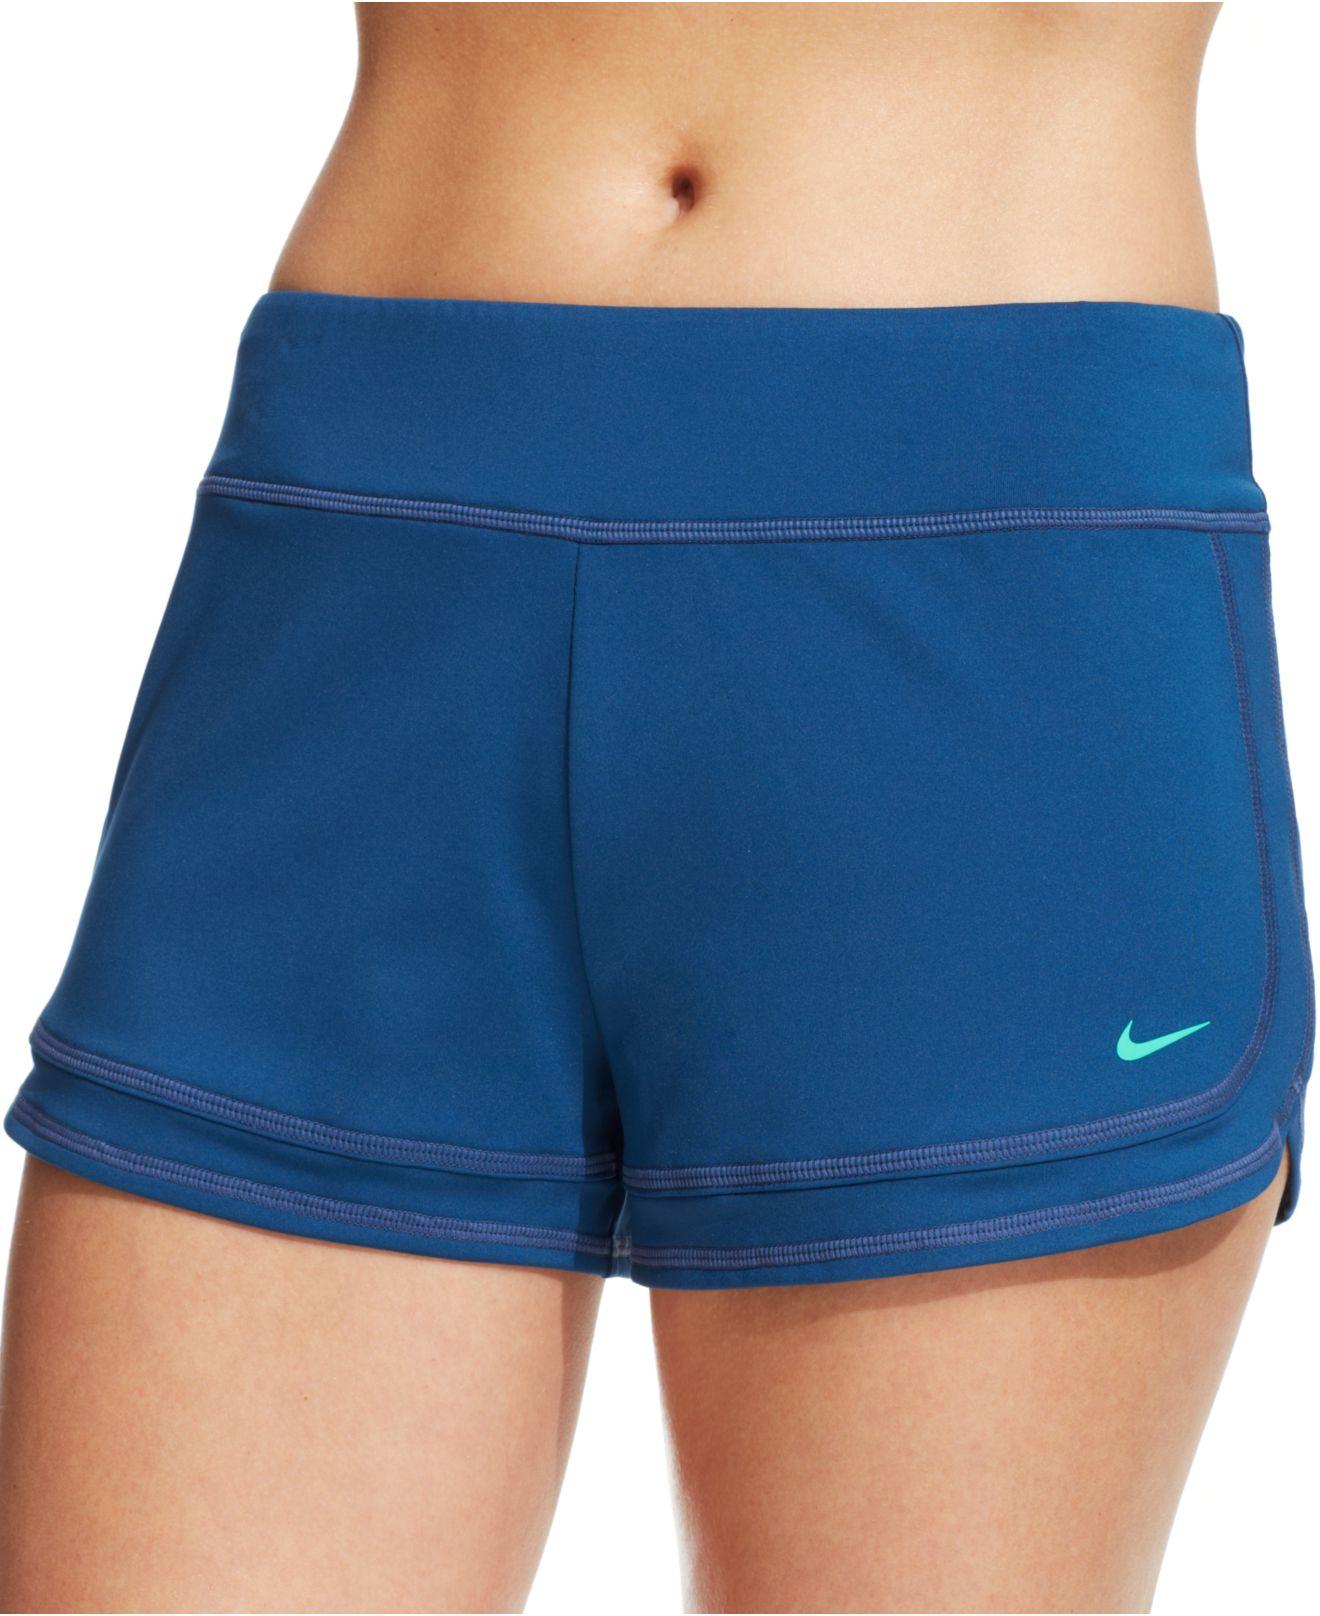 Lyst - Nike Logo Coverup Swim Shorts in Blue 6bcdacd19f